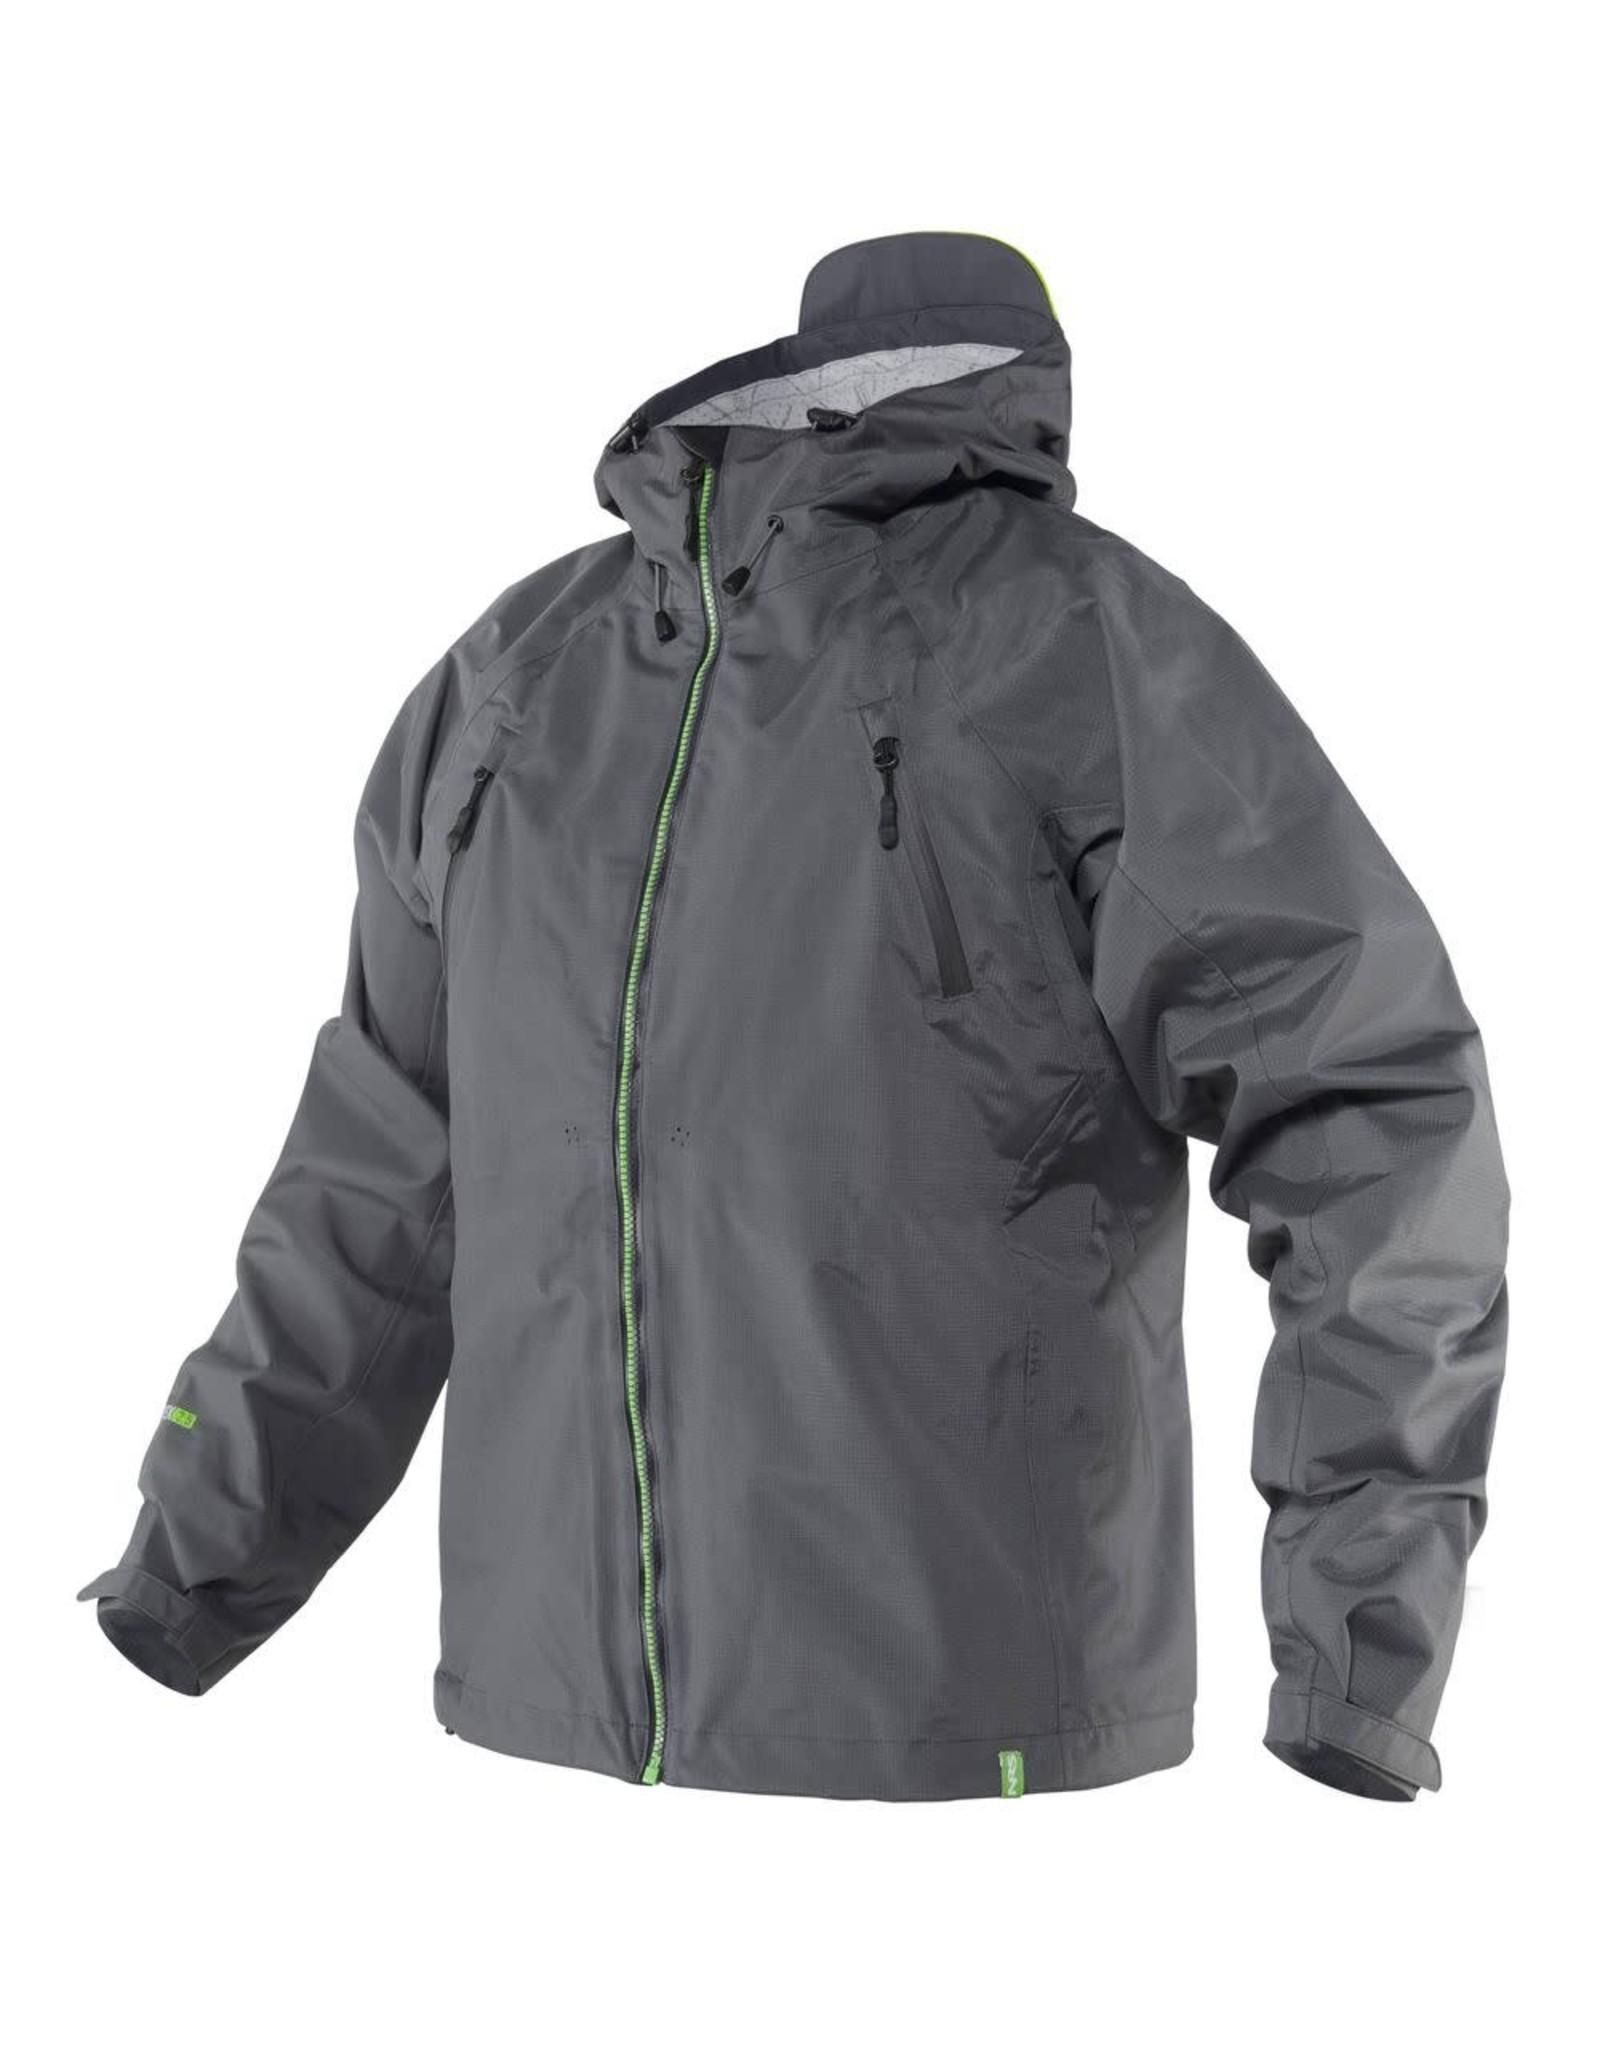 NRS NRS Champion Jacket